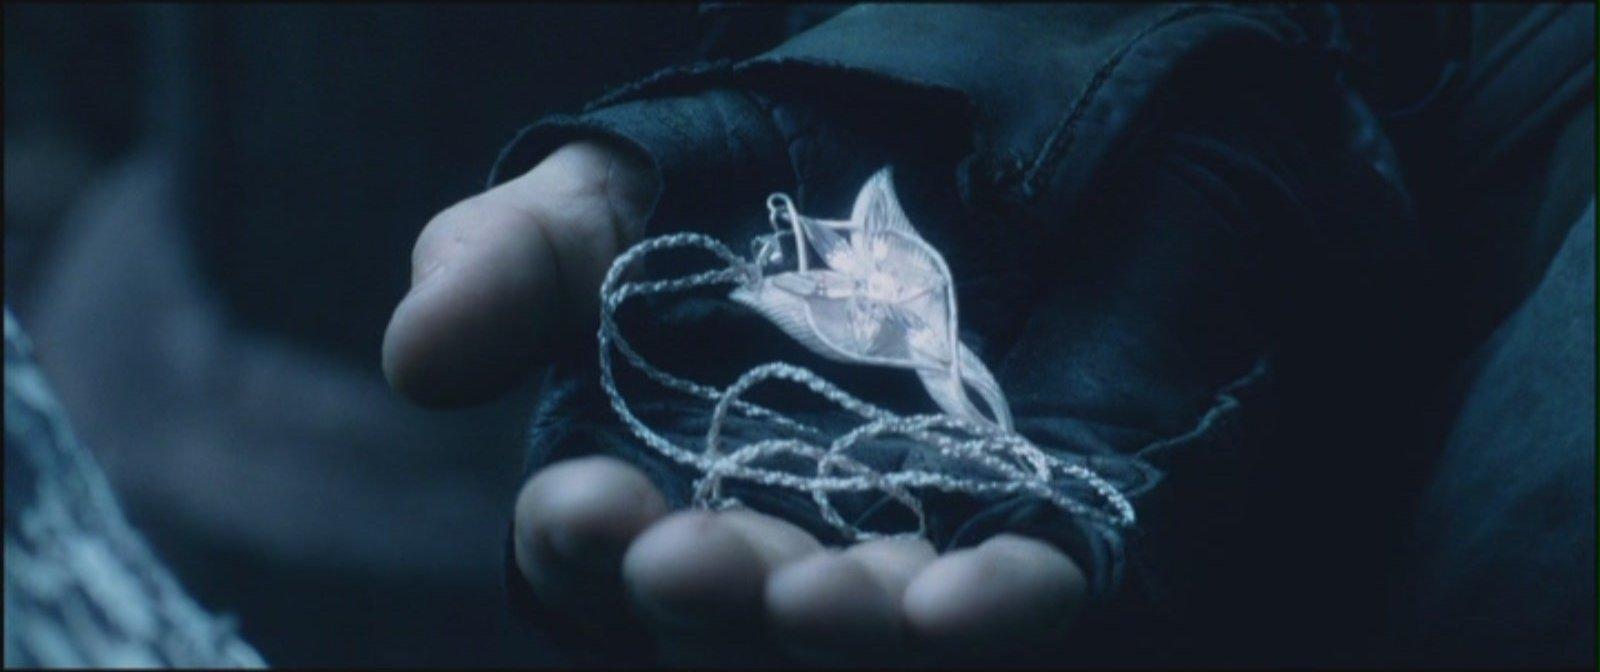 arwen and aragorn